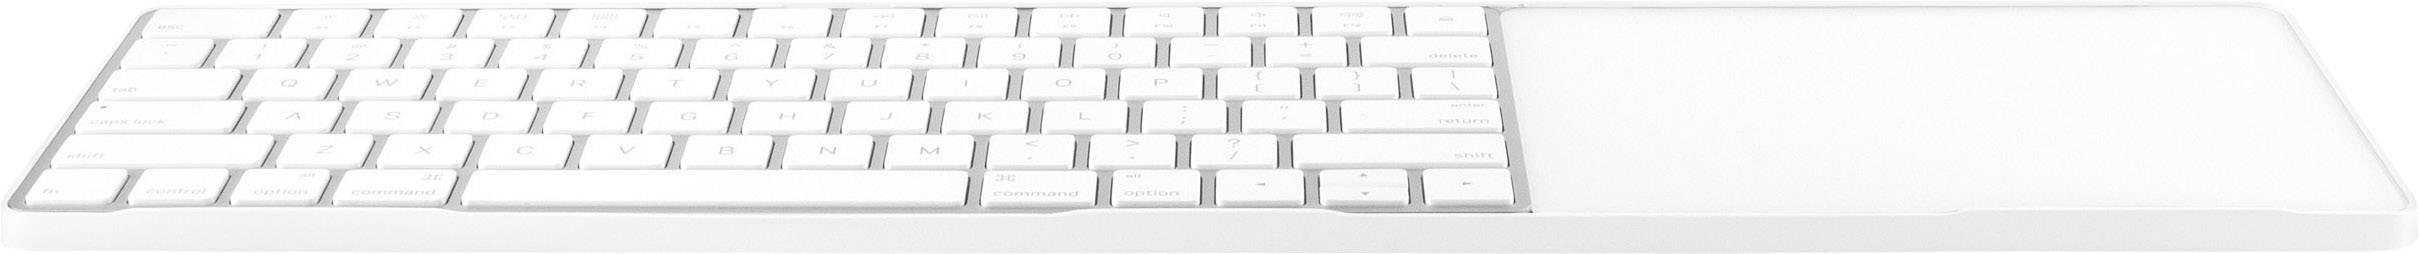 Twelve South Magicbridge Keyboard Support Tray White Conrad Com